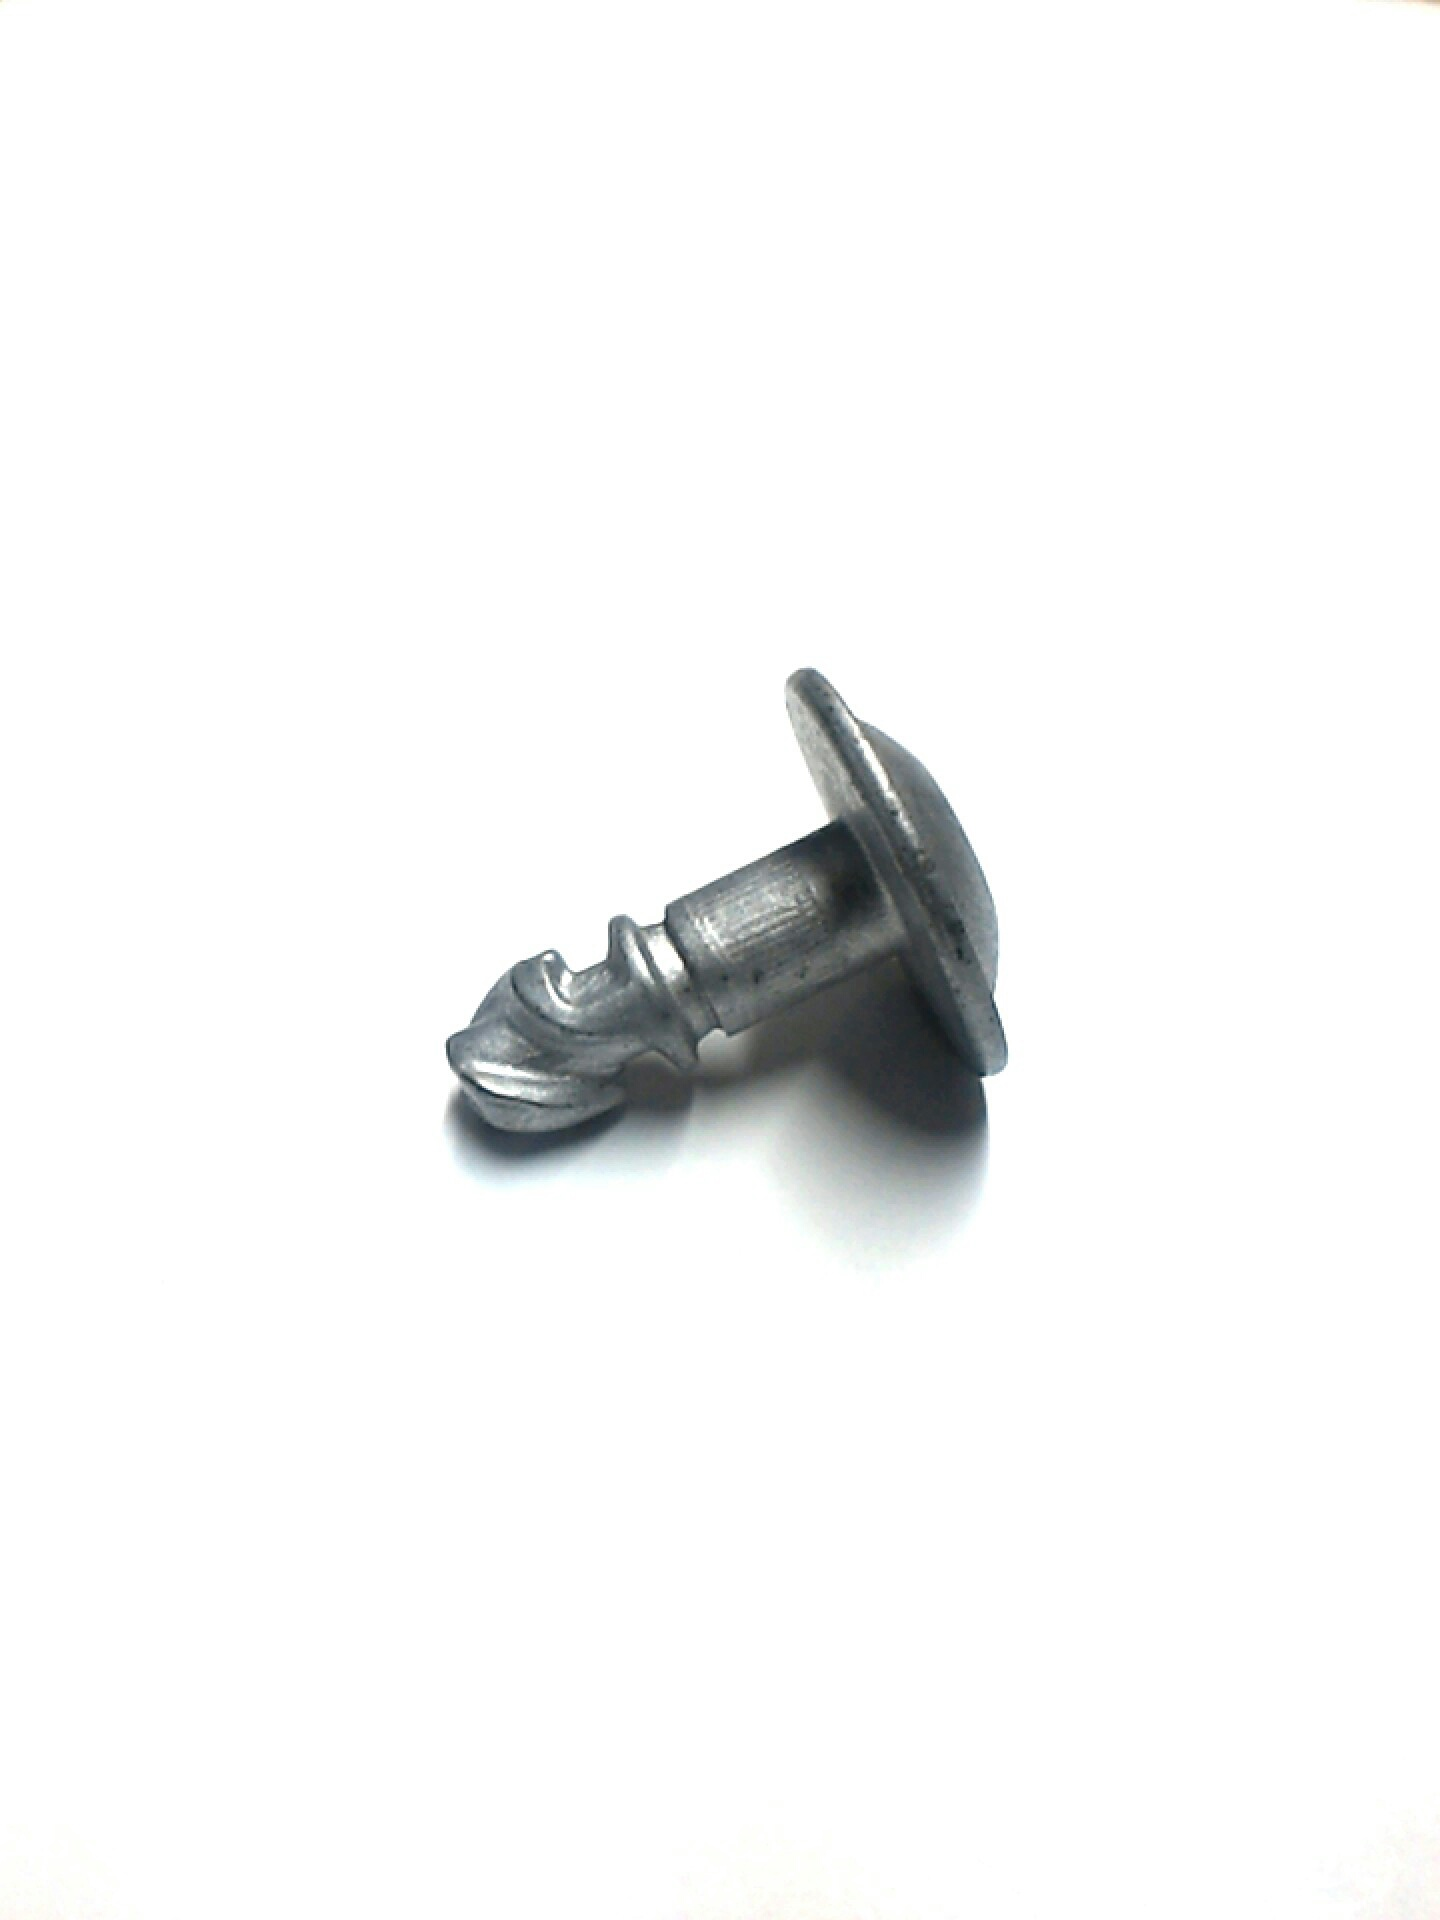 bmw 540i screw plug l 13 5mm engine compartment air. Black Bedroom Furniture Sets. Home Design Ideas